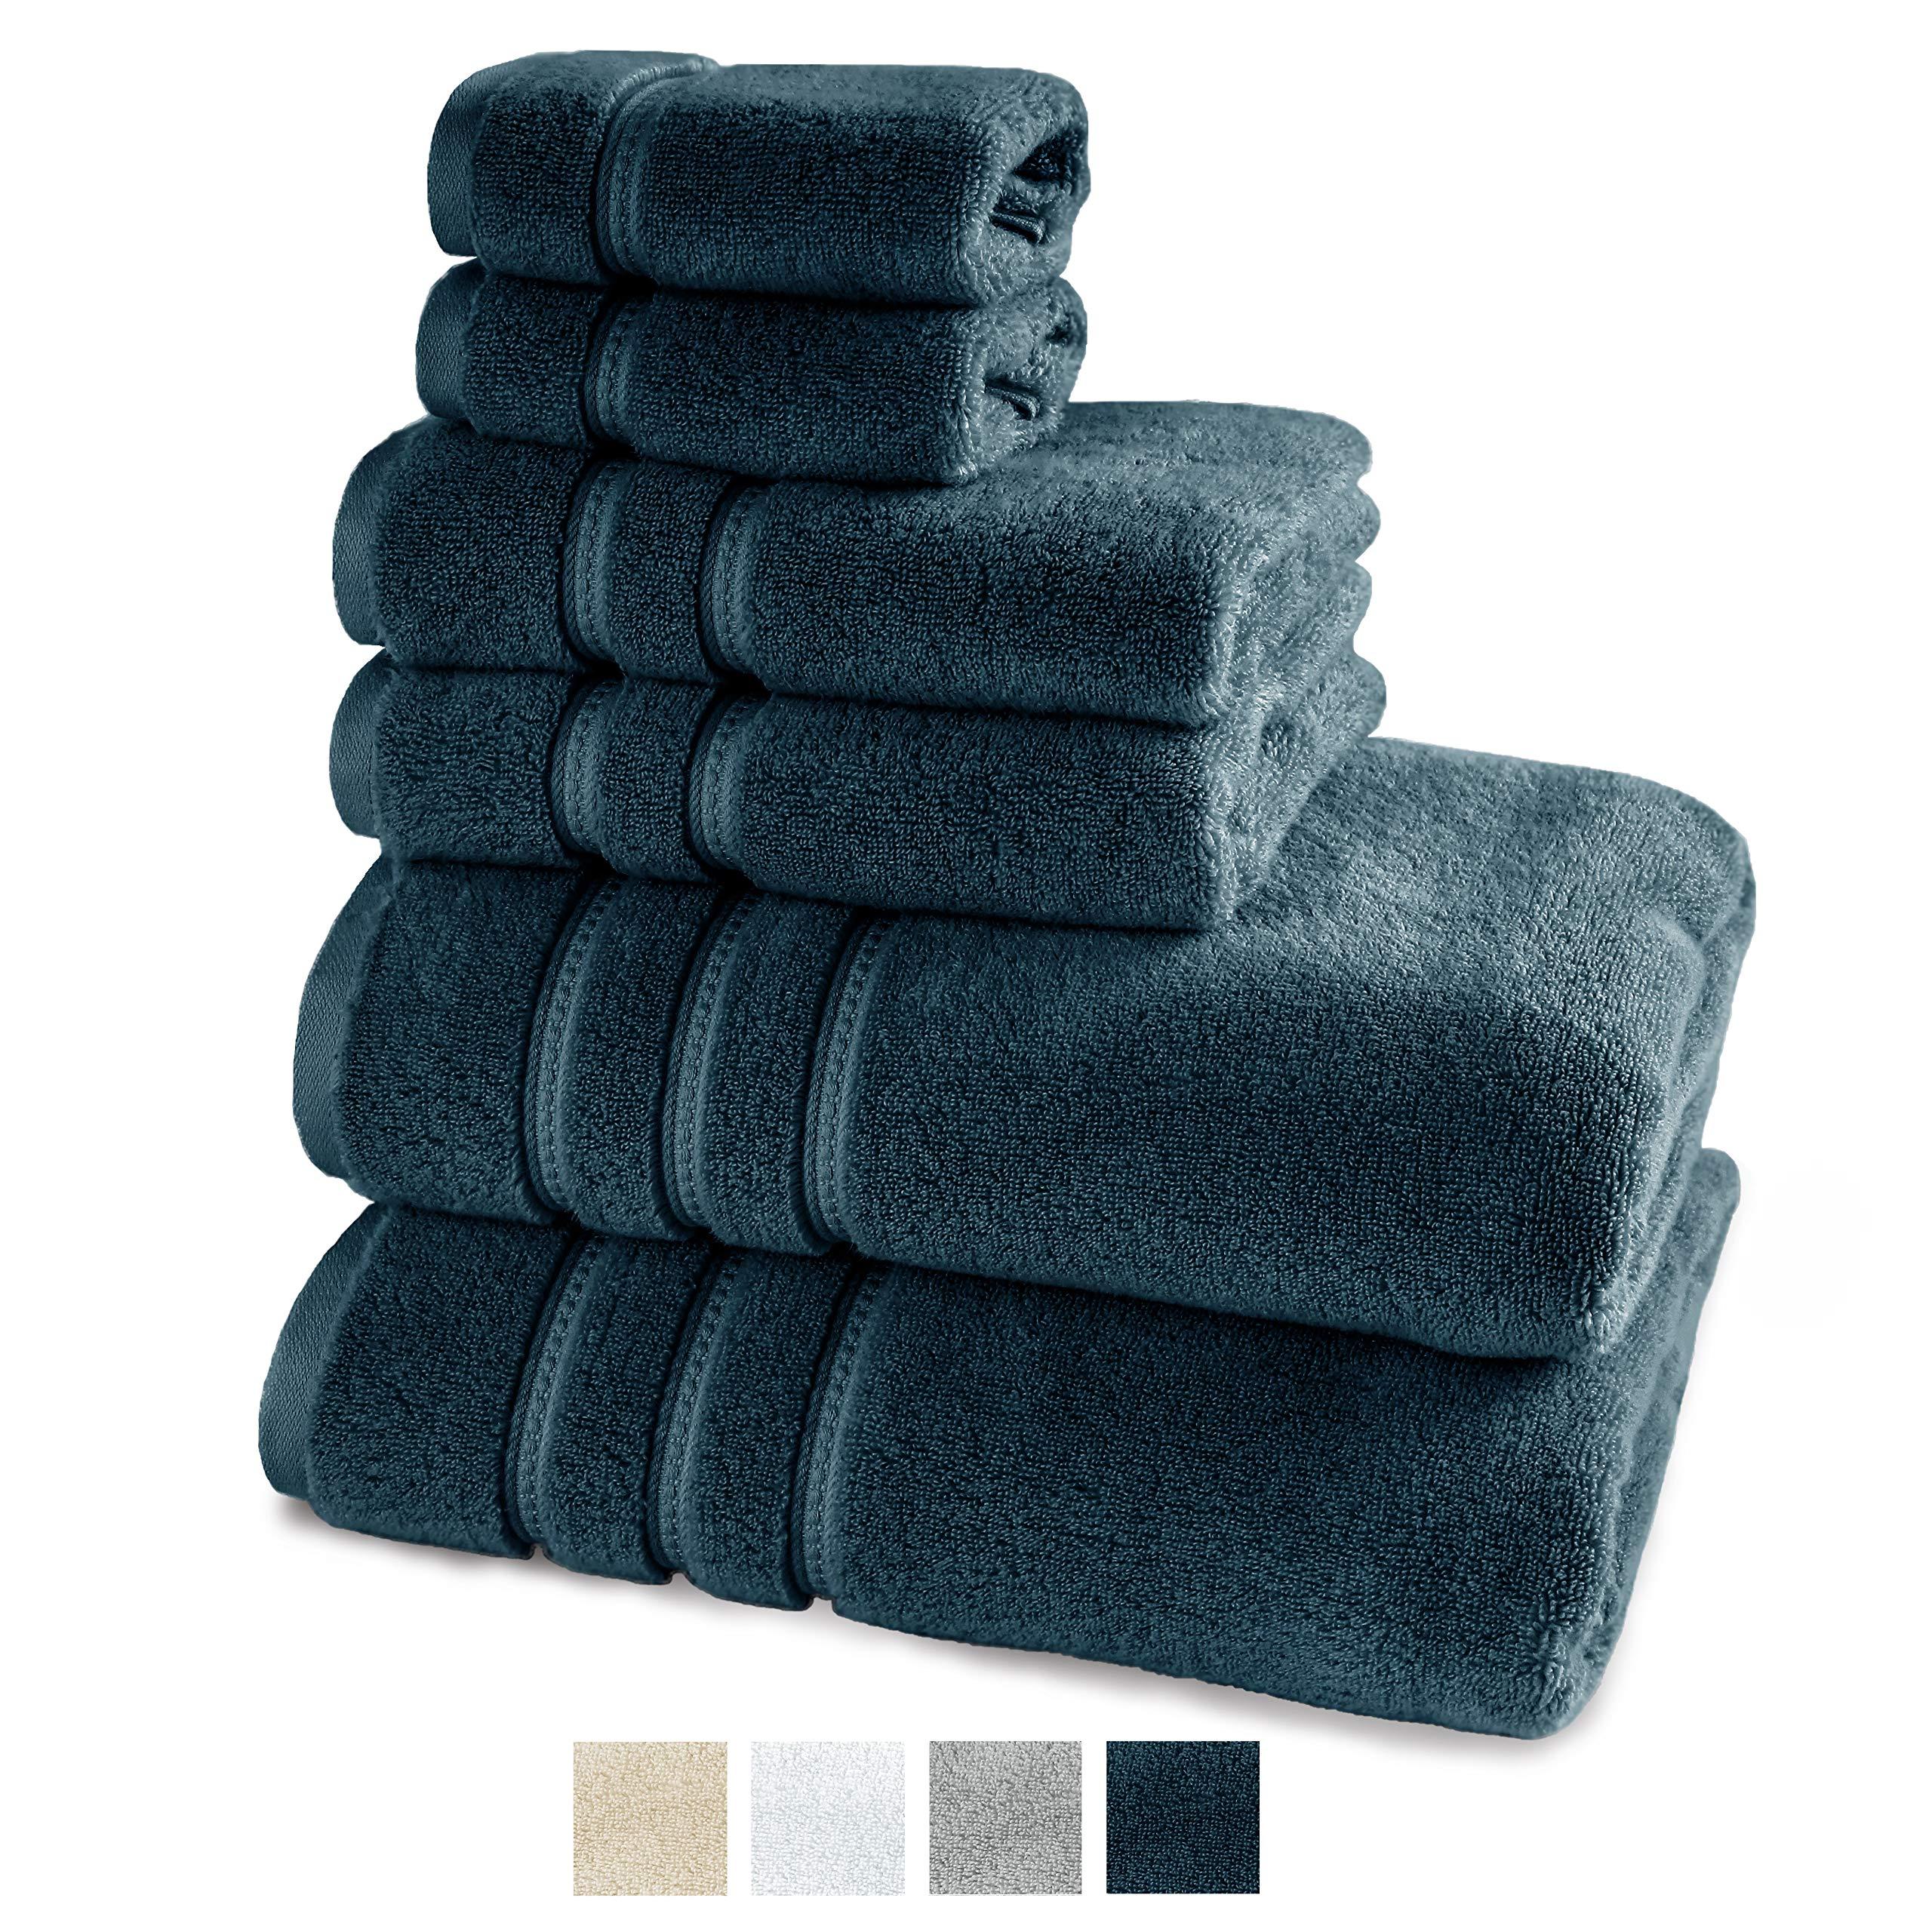 TRIDENT Large Bath Towels, 100% Cotton Zero Twist Towels 6 Piece Set -2 Bath, 2 Hand, 2 Washcloths, Softer Than a Cloud, Premium, Absorbent, Luxury Hotel Collection (Navy)